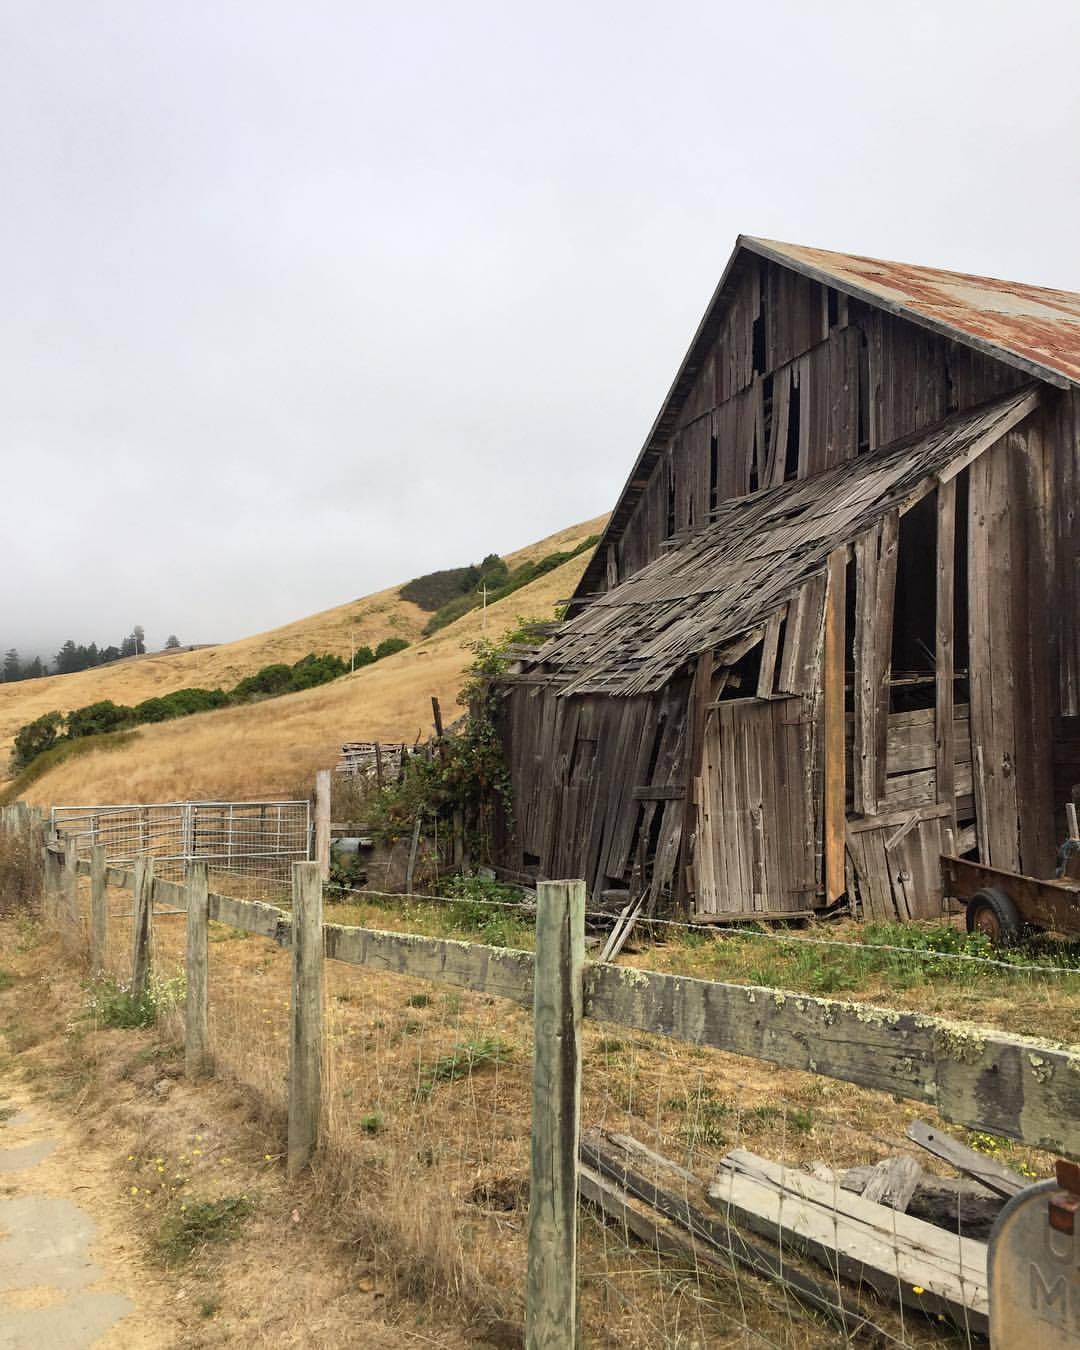 Dreamy dilapidation.  #california #sonoma #sonomacoast  (at Jenner, California)